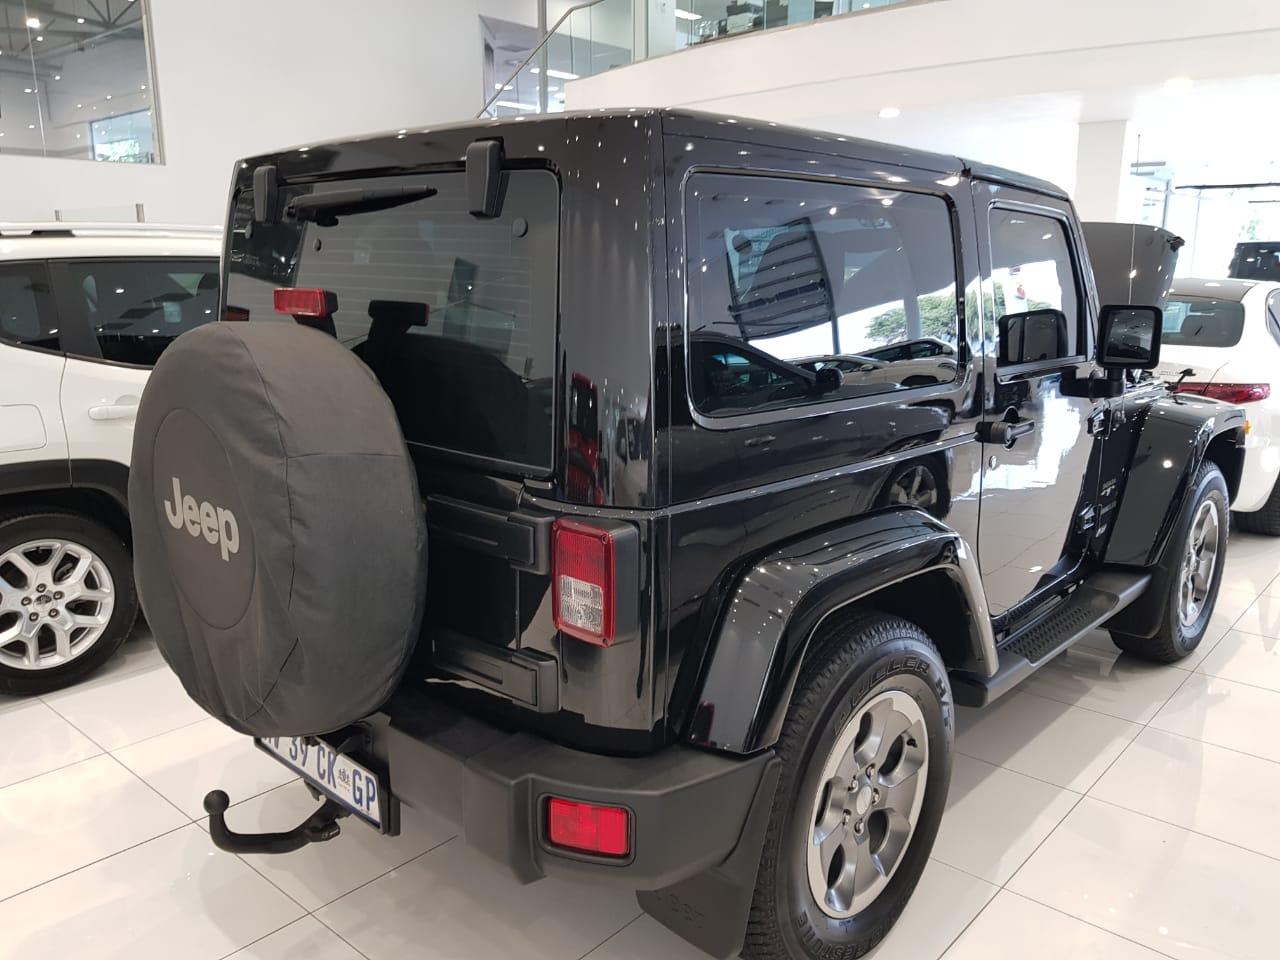 2019 Jeep Wrangler 3.6L Sahara